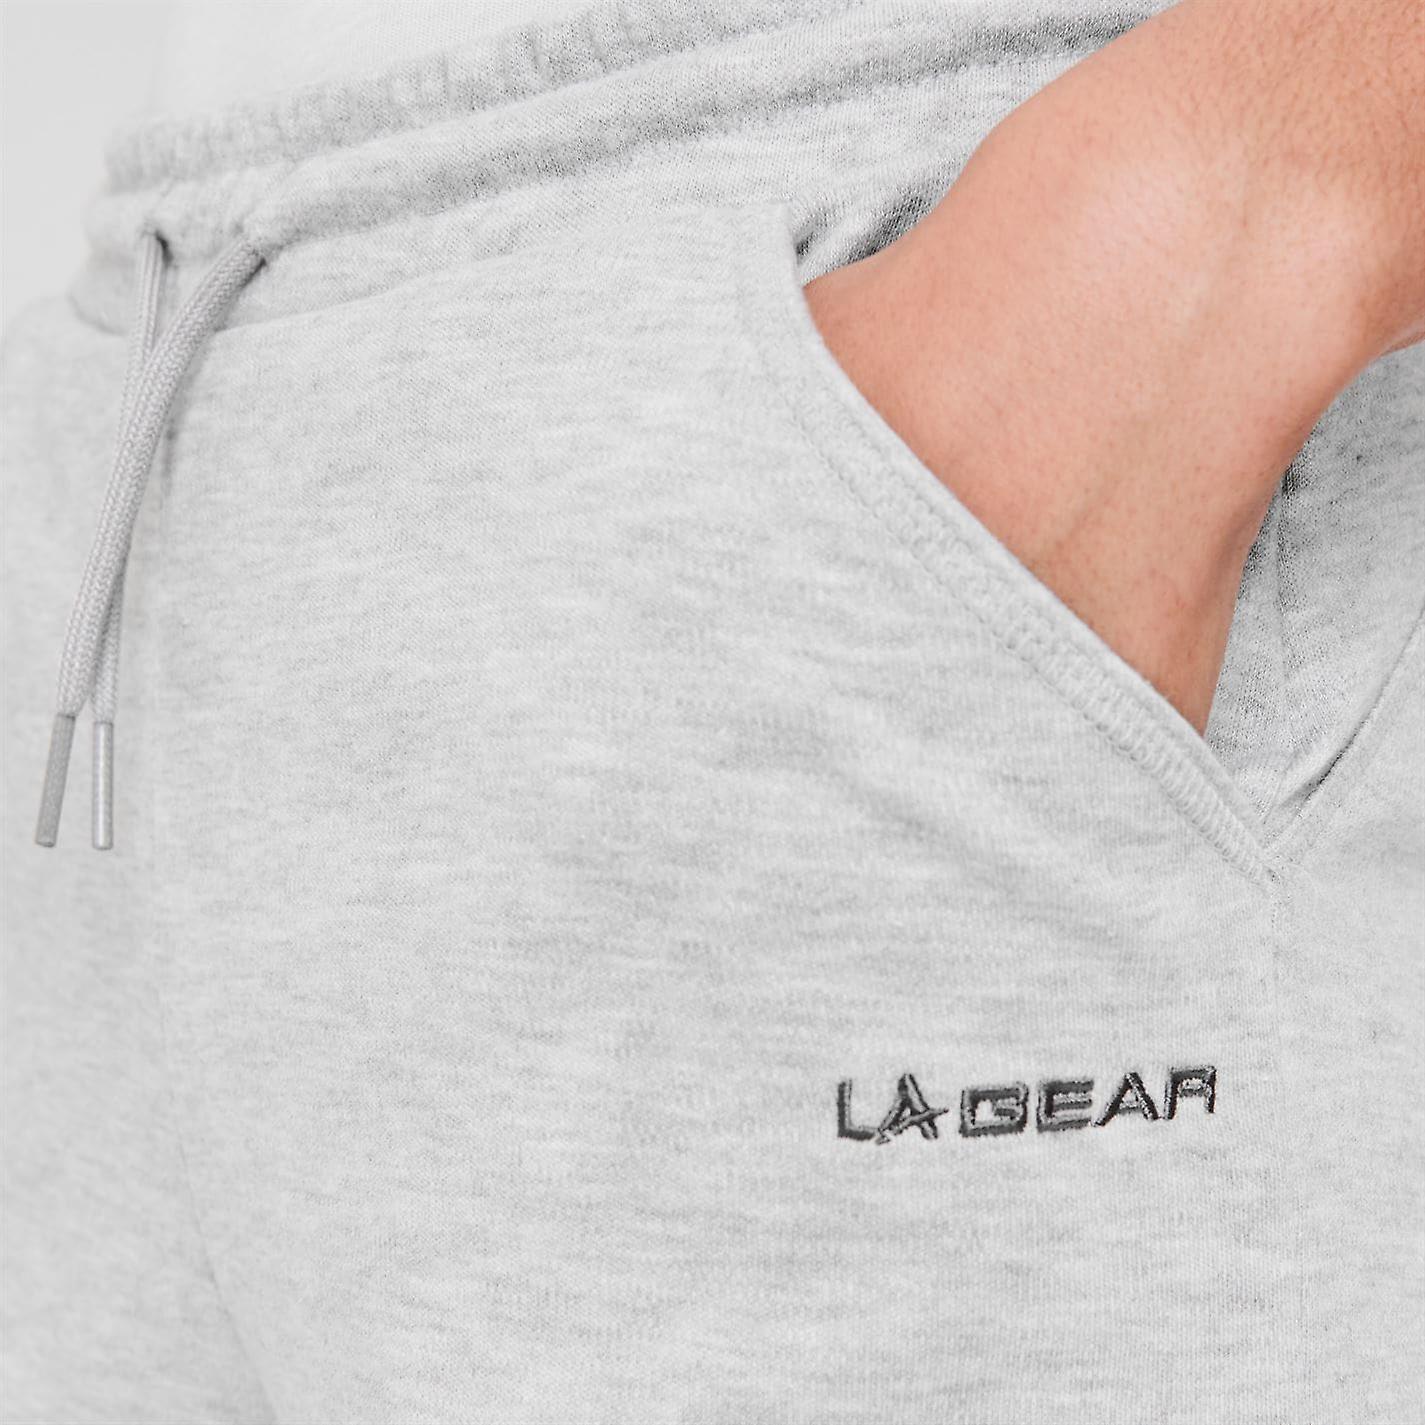 LA Gear I Lk Pants Sports Running Jogging Joggers Womens Ladies